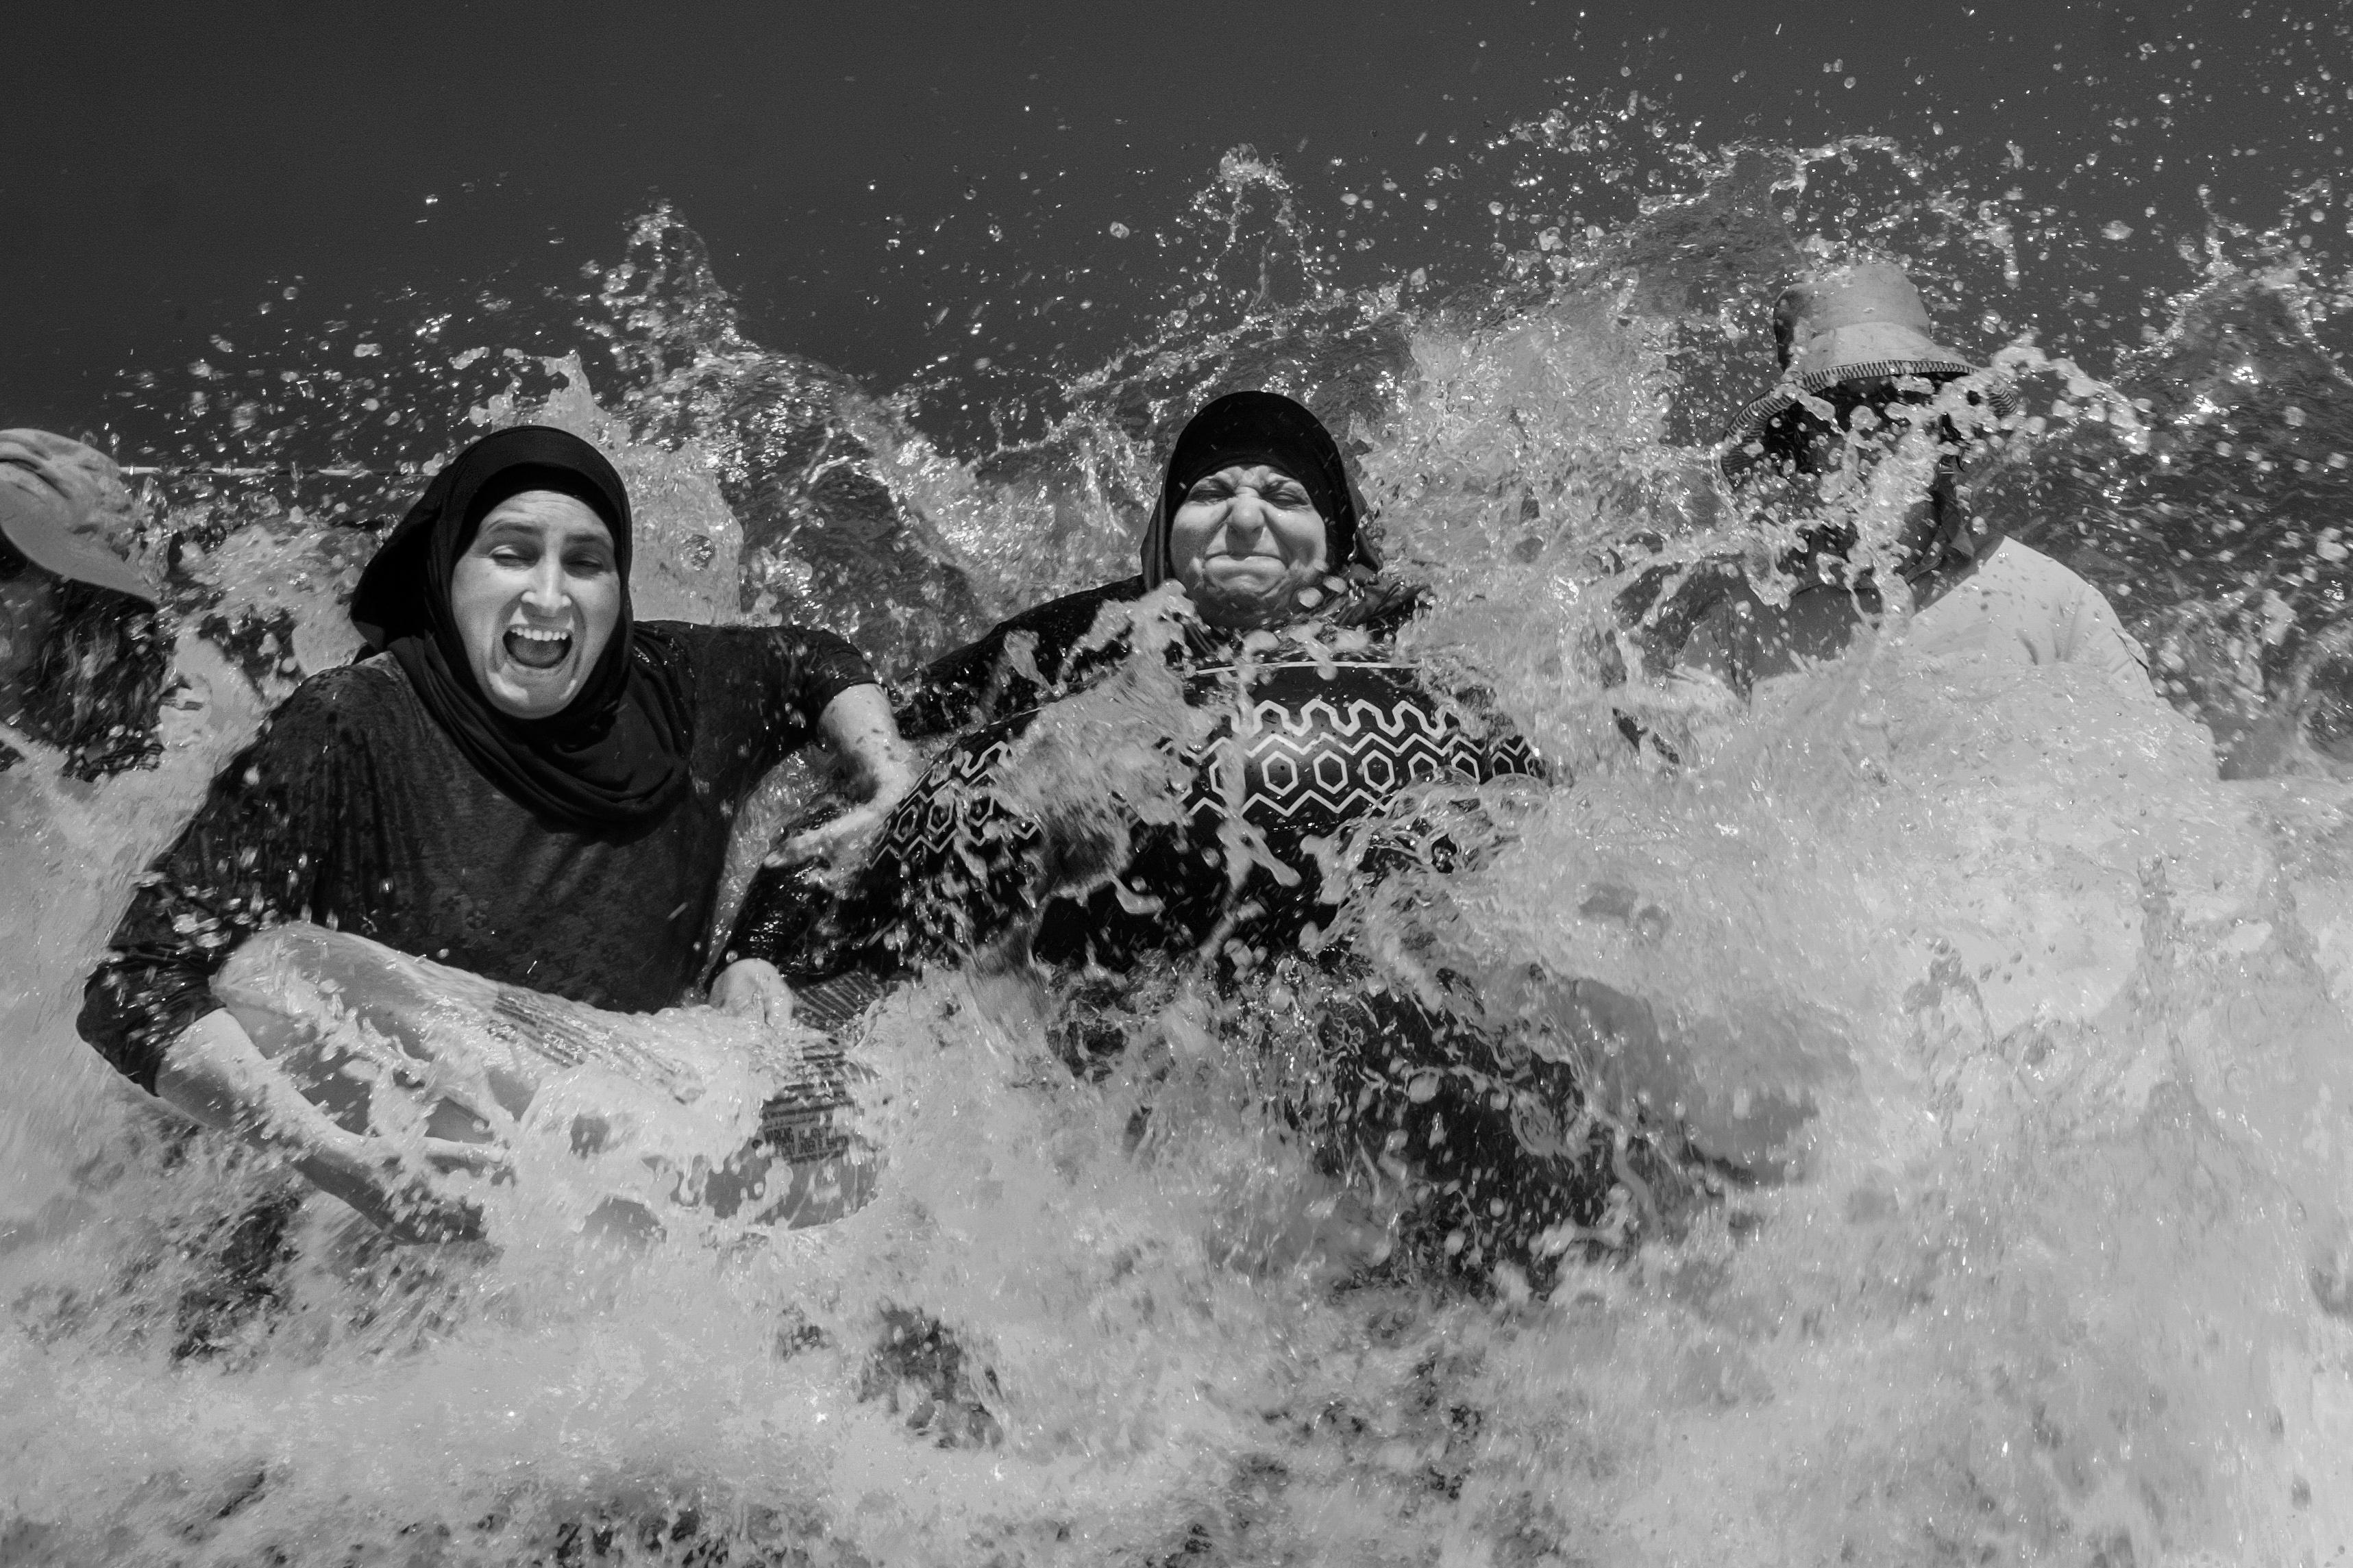 Orna Naor, 'Women of the Sea', 2019